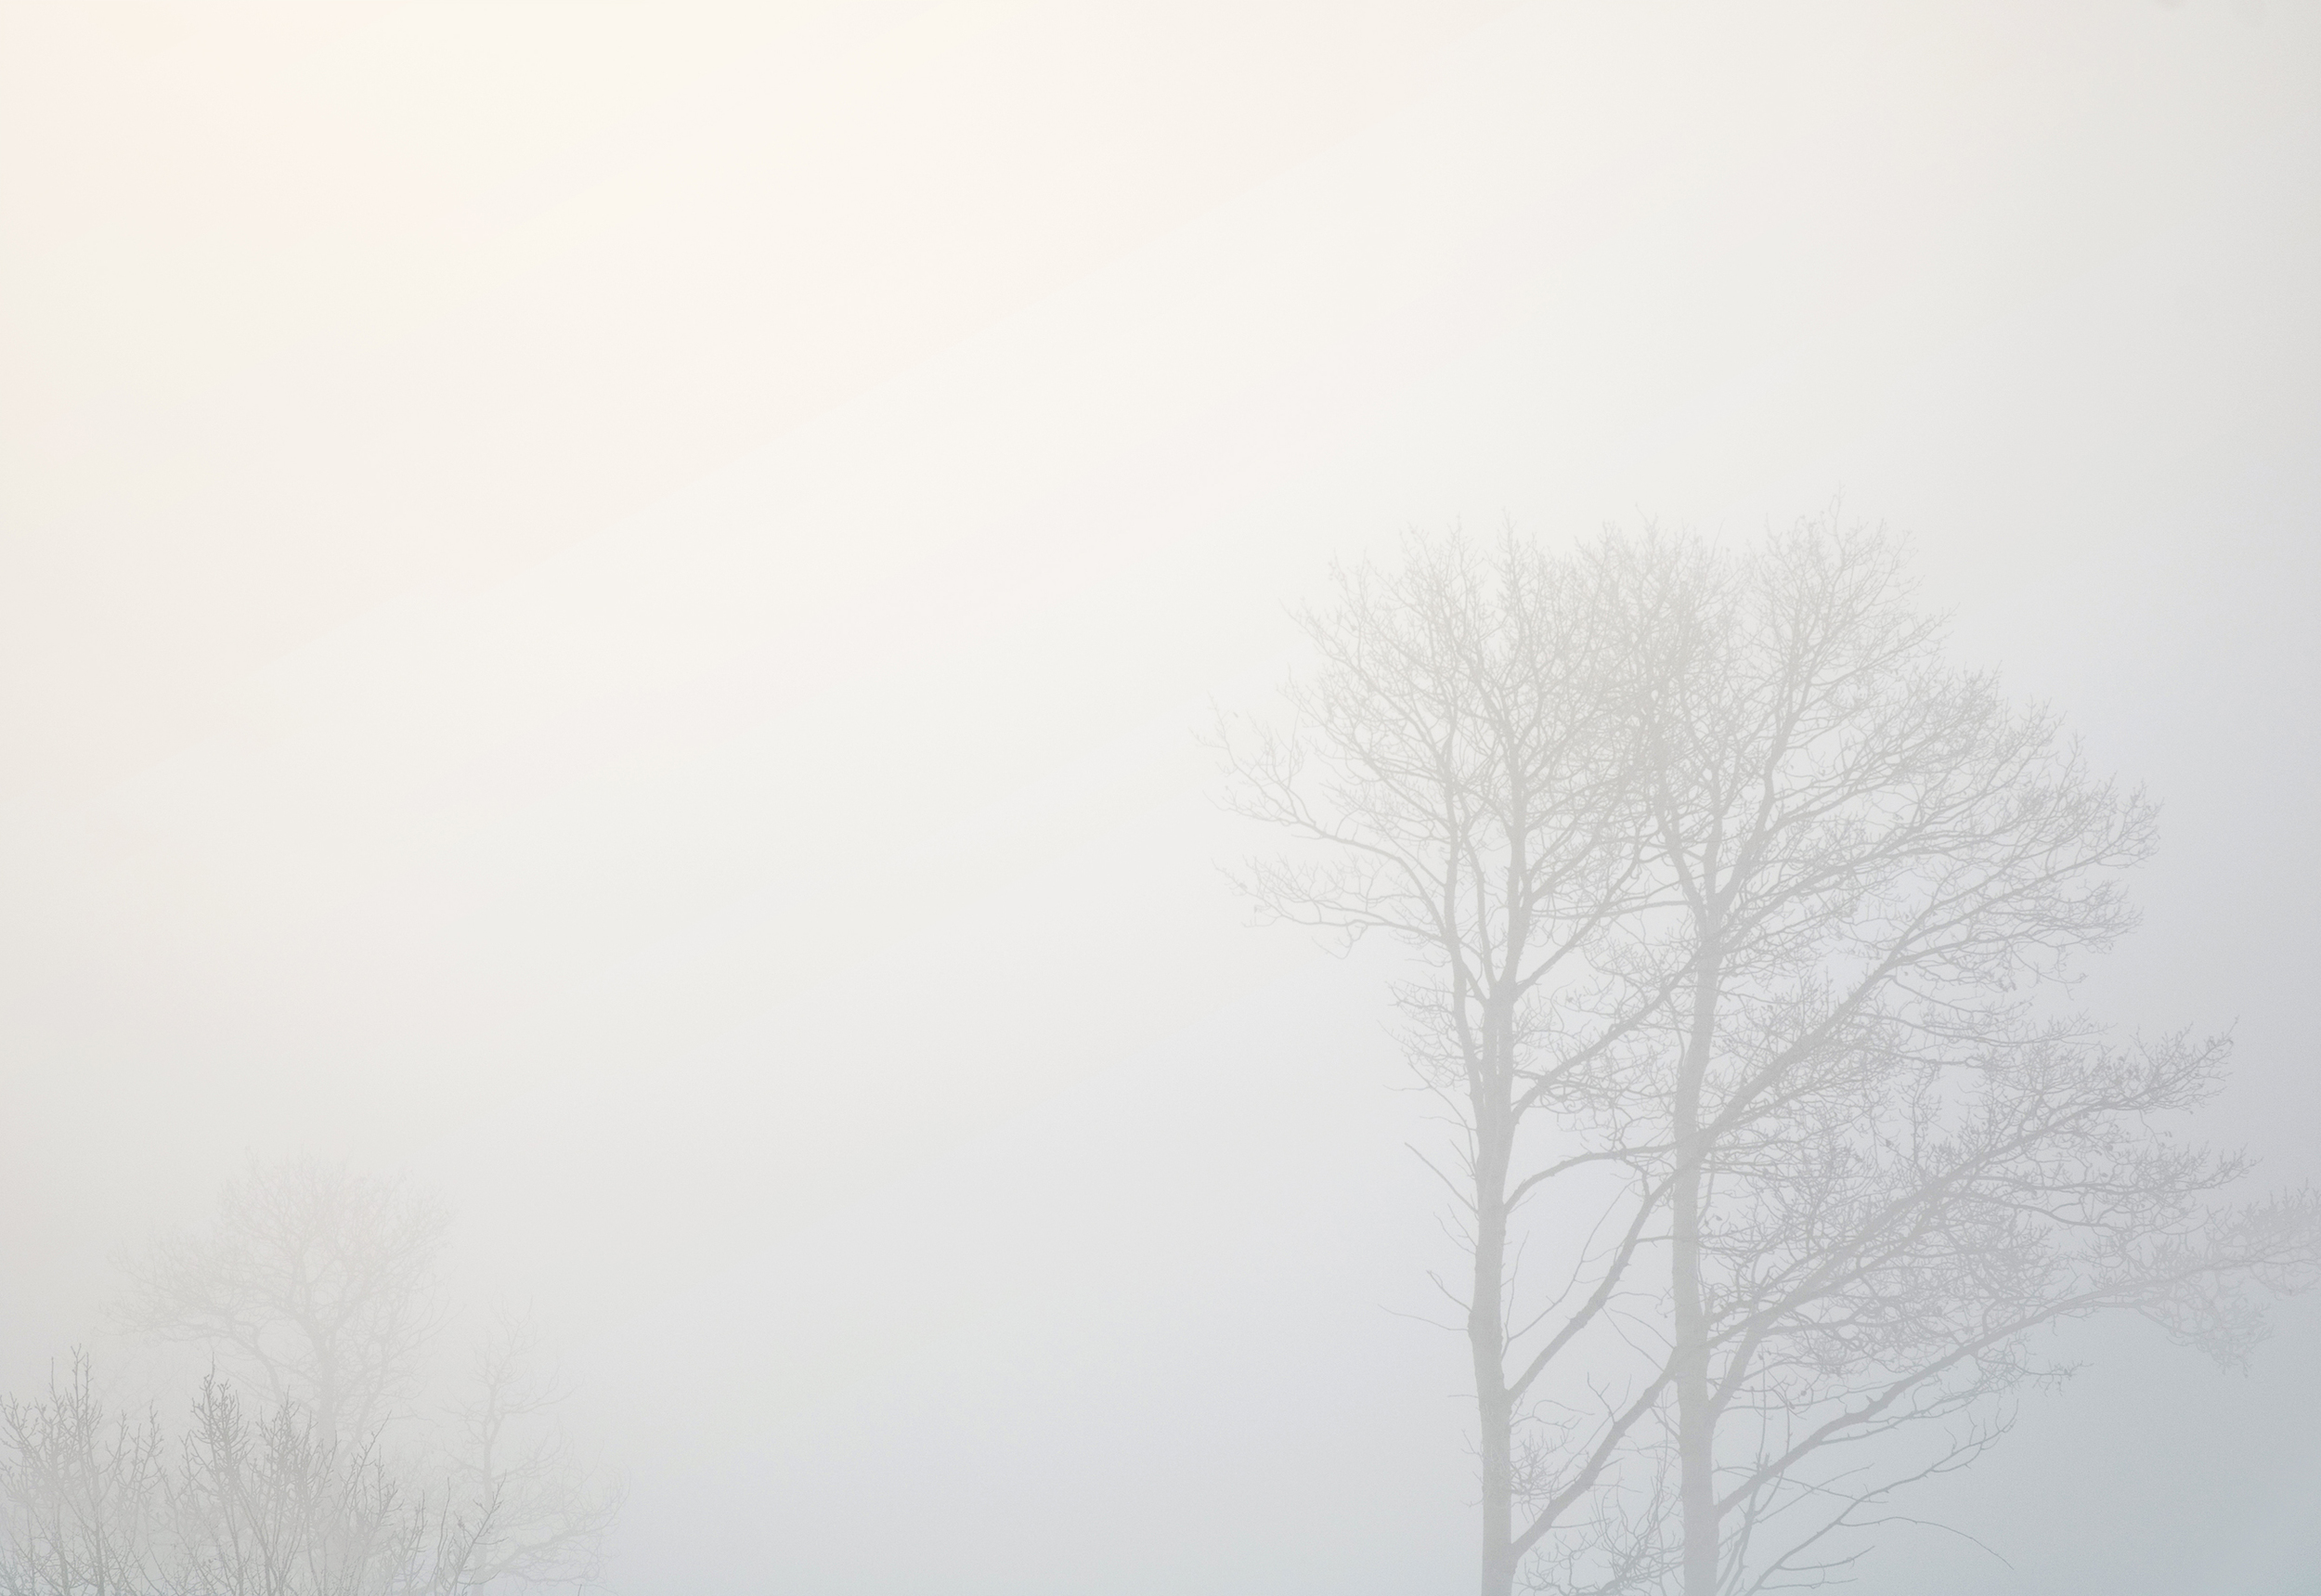 distance-tree#3-flt.jpg